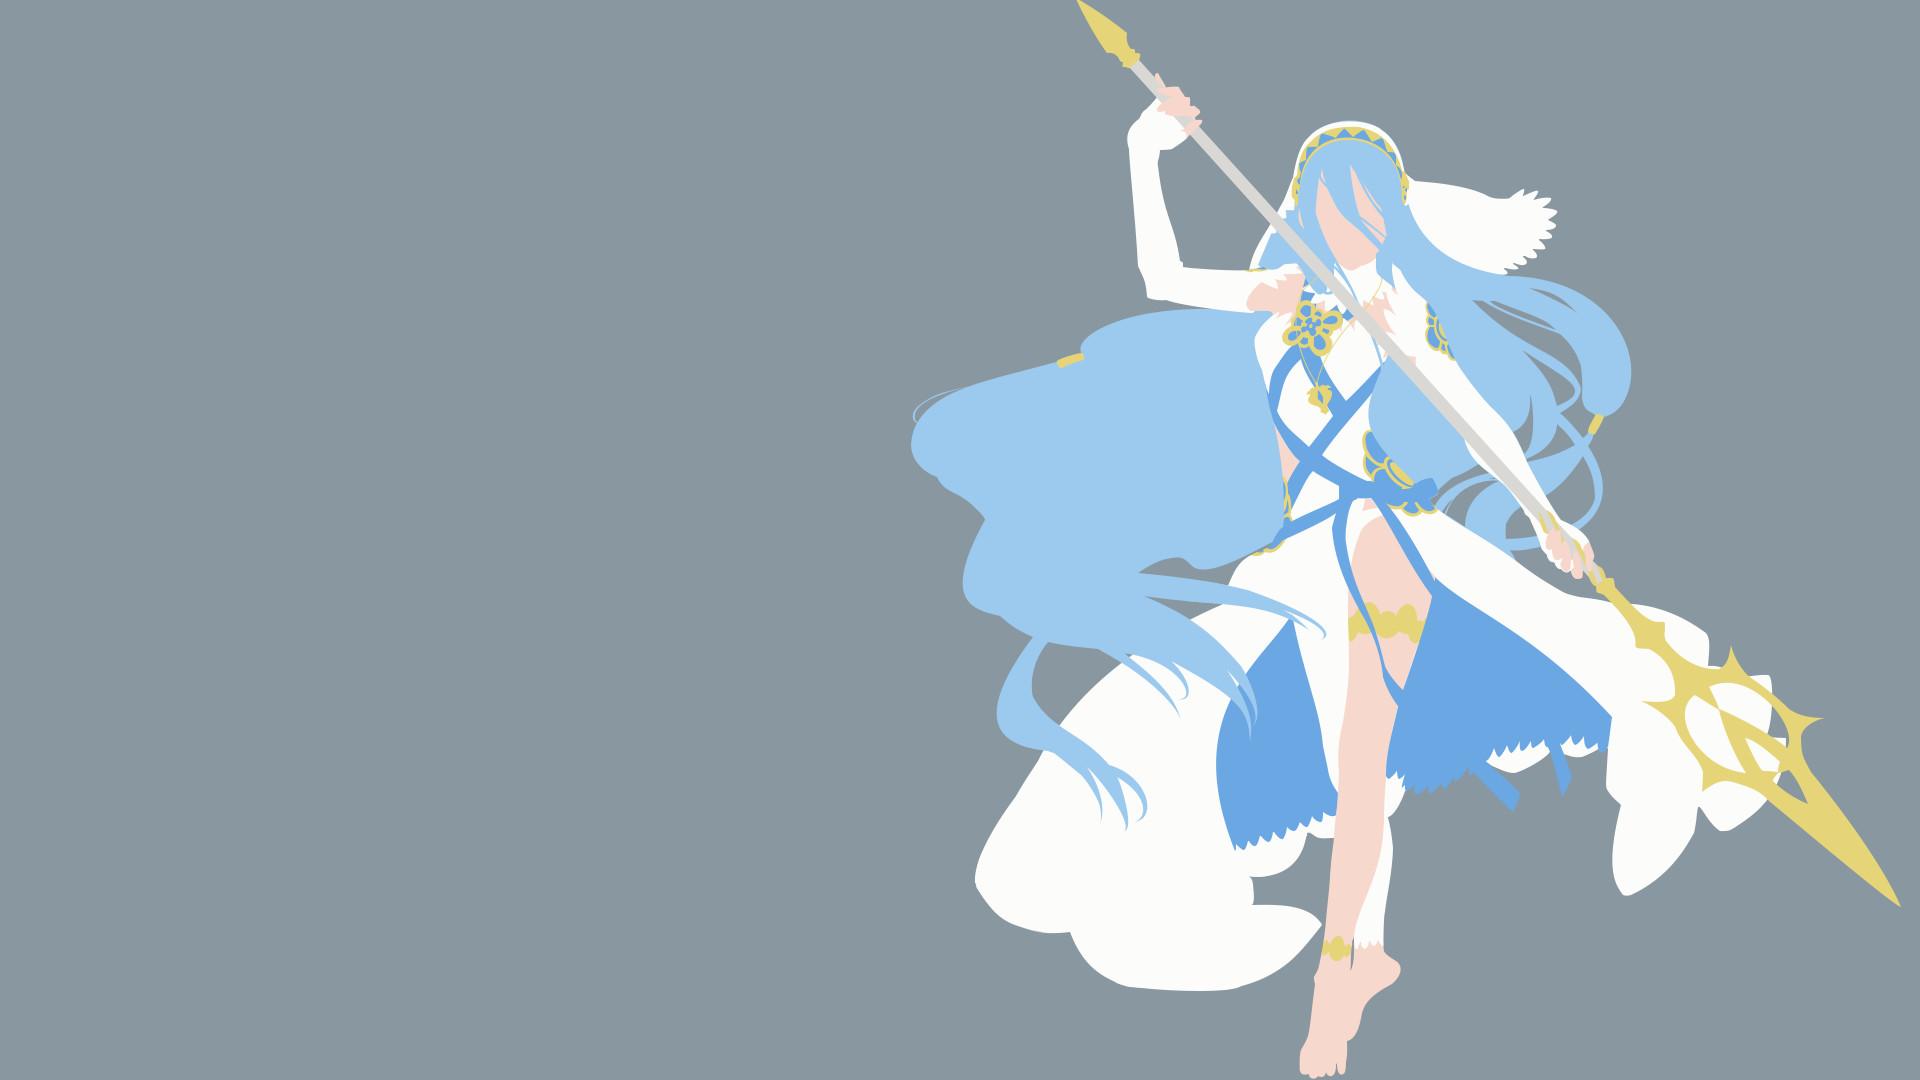 … Fire Emblem IF Aqua by etaribi